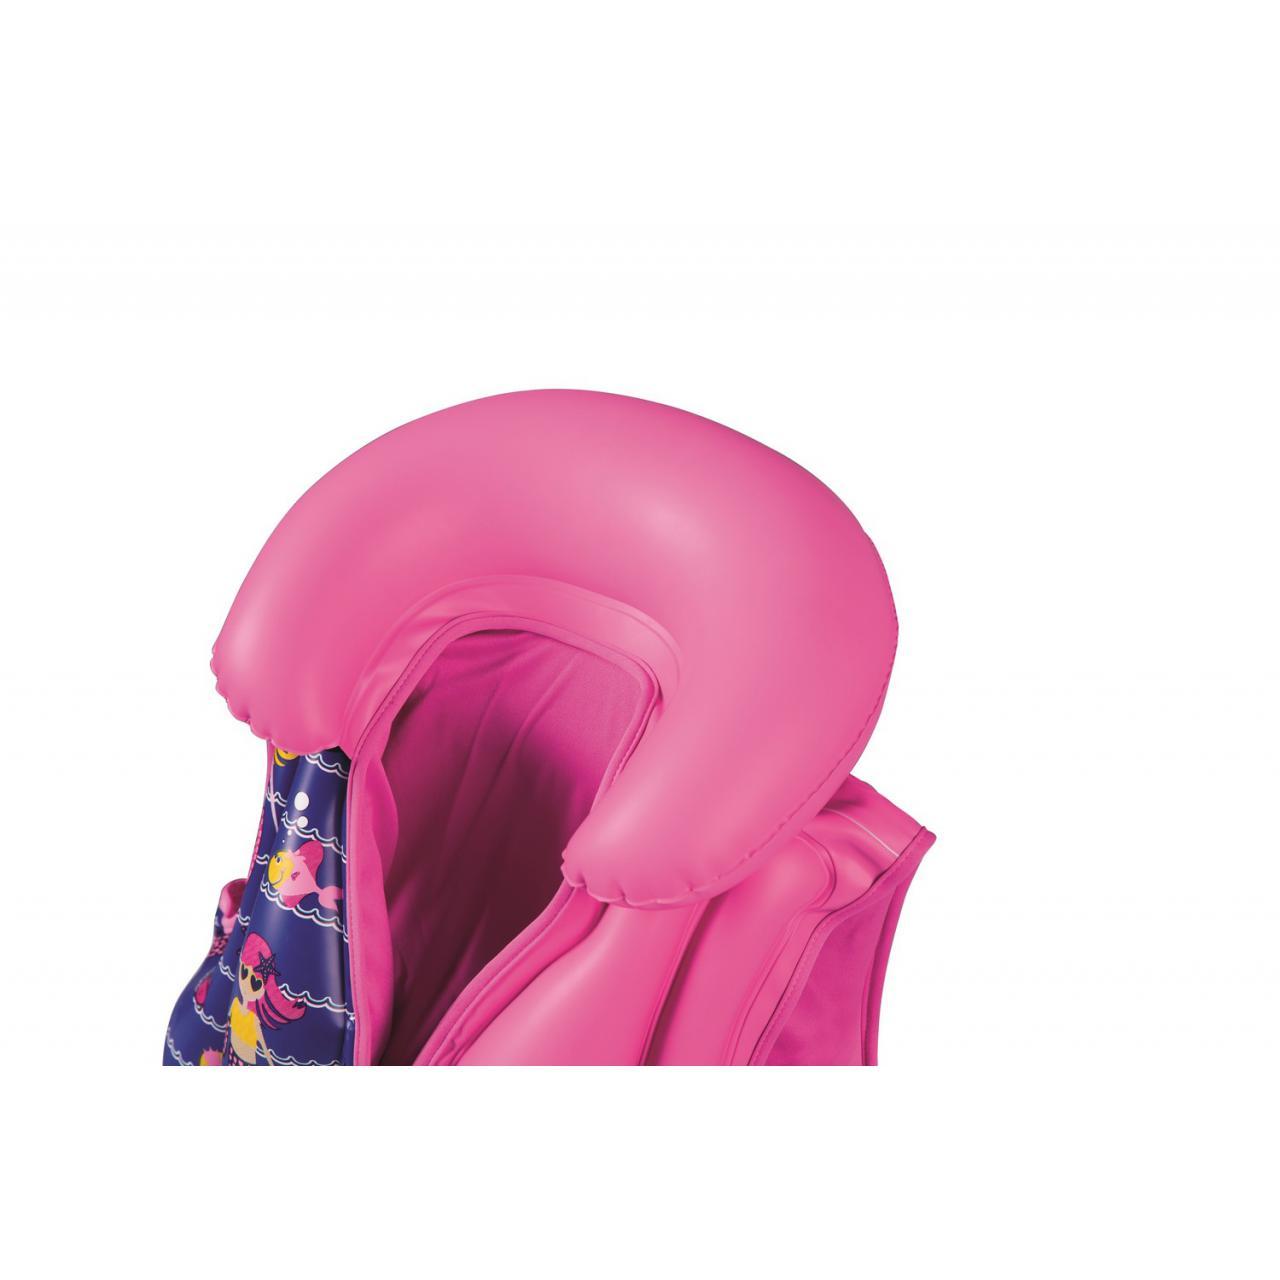 Gilet-flottant-natation-Bestway-Girl-inflatable-3-6-ans-Rose-70799-Neuf miniature 4